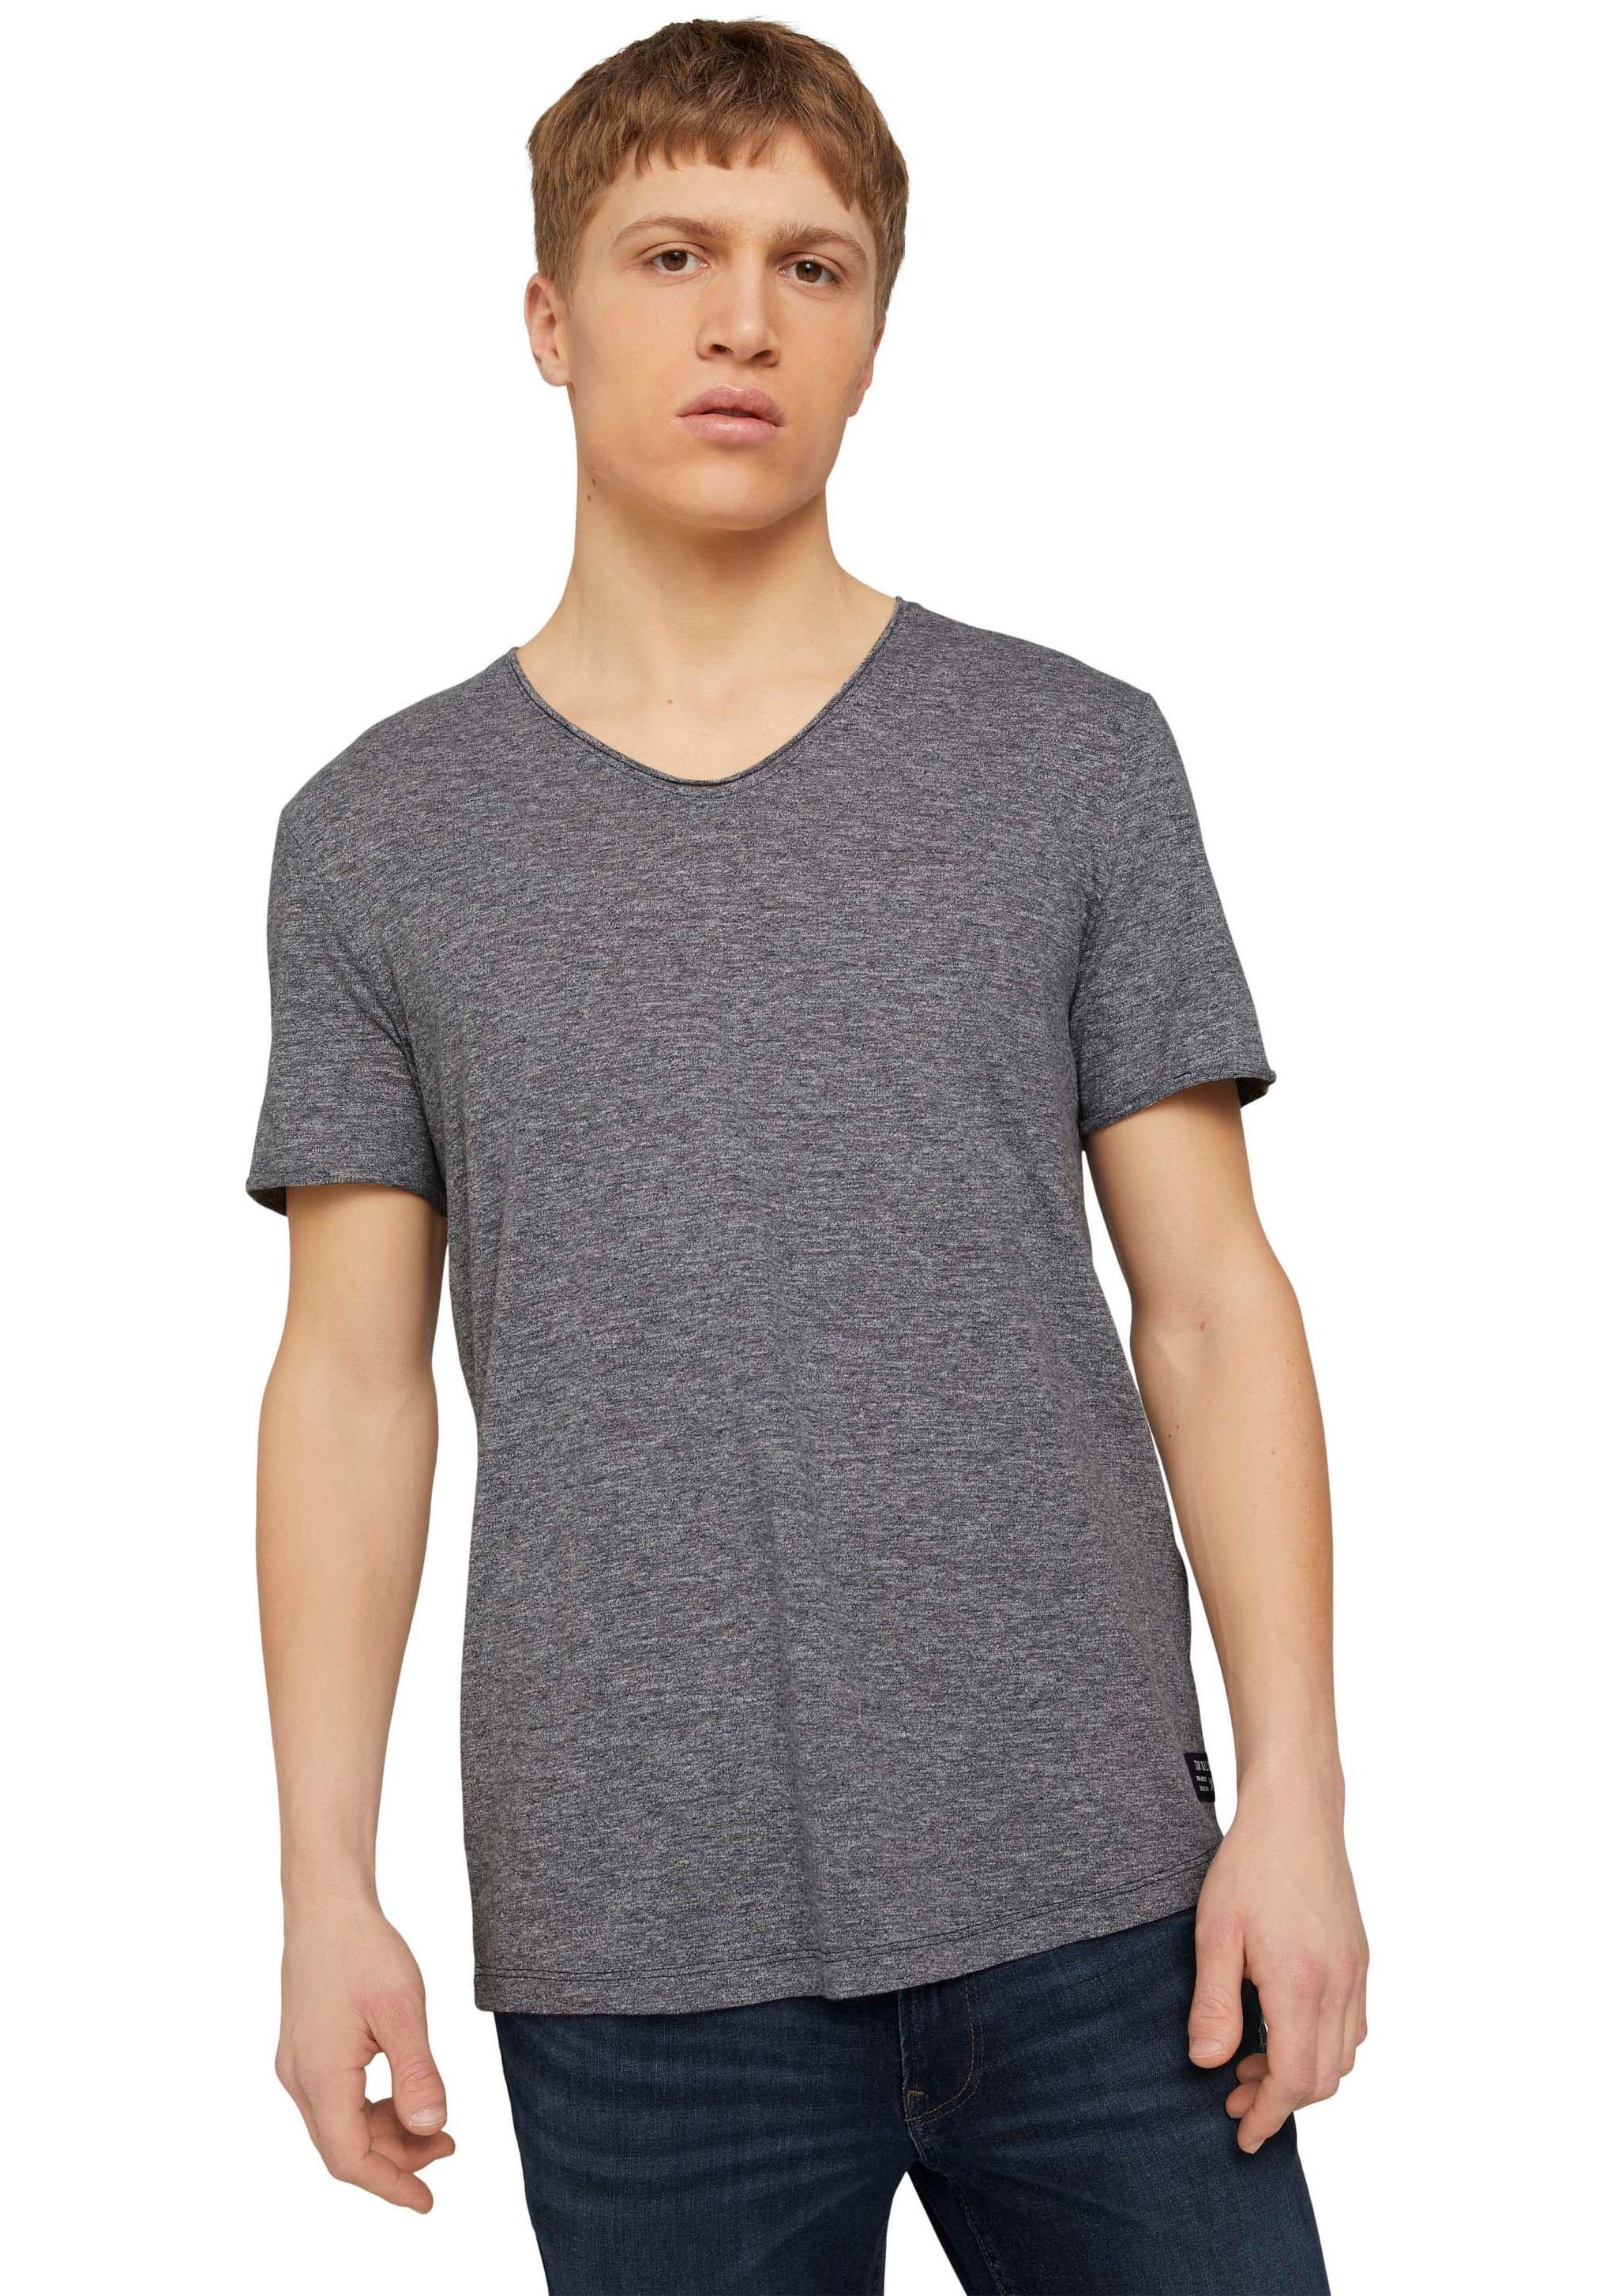 tom tailor denim -  T-Shirt, mit V-Ausschnitt